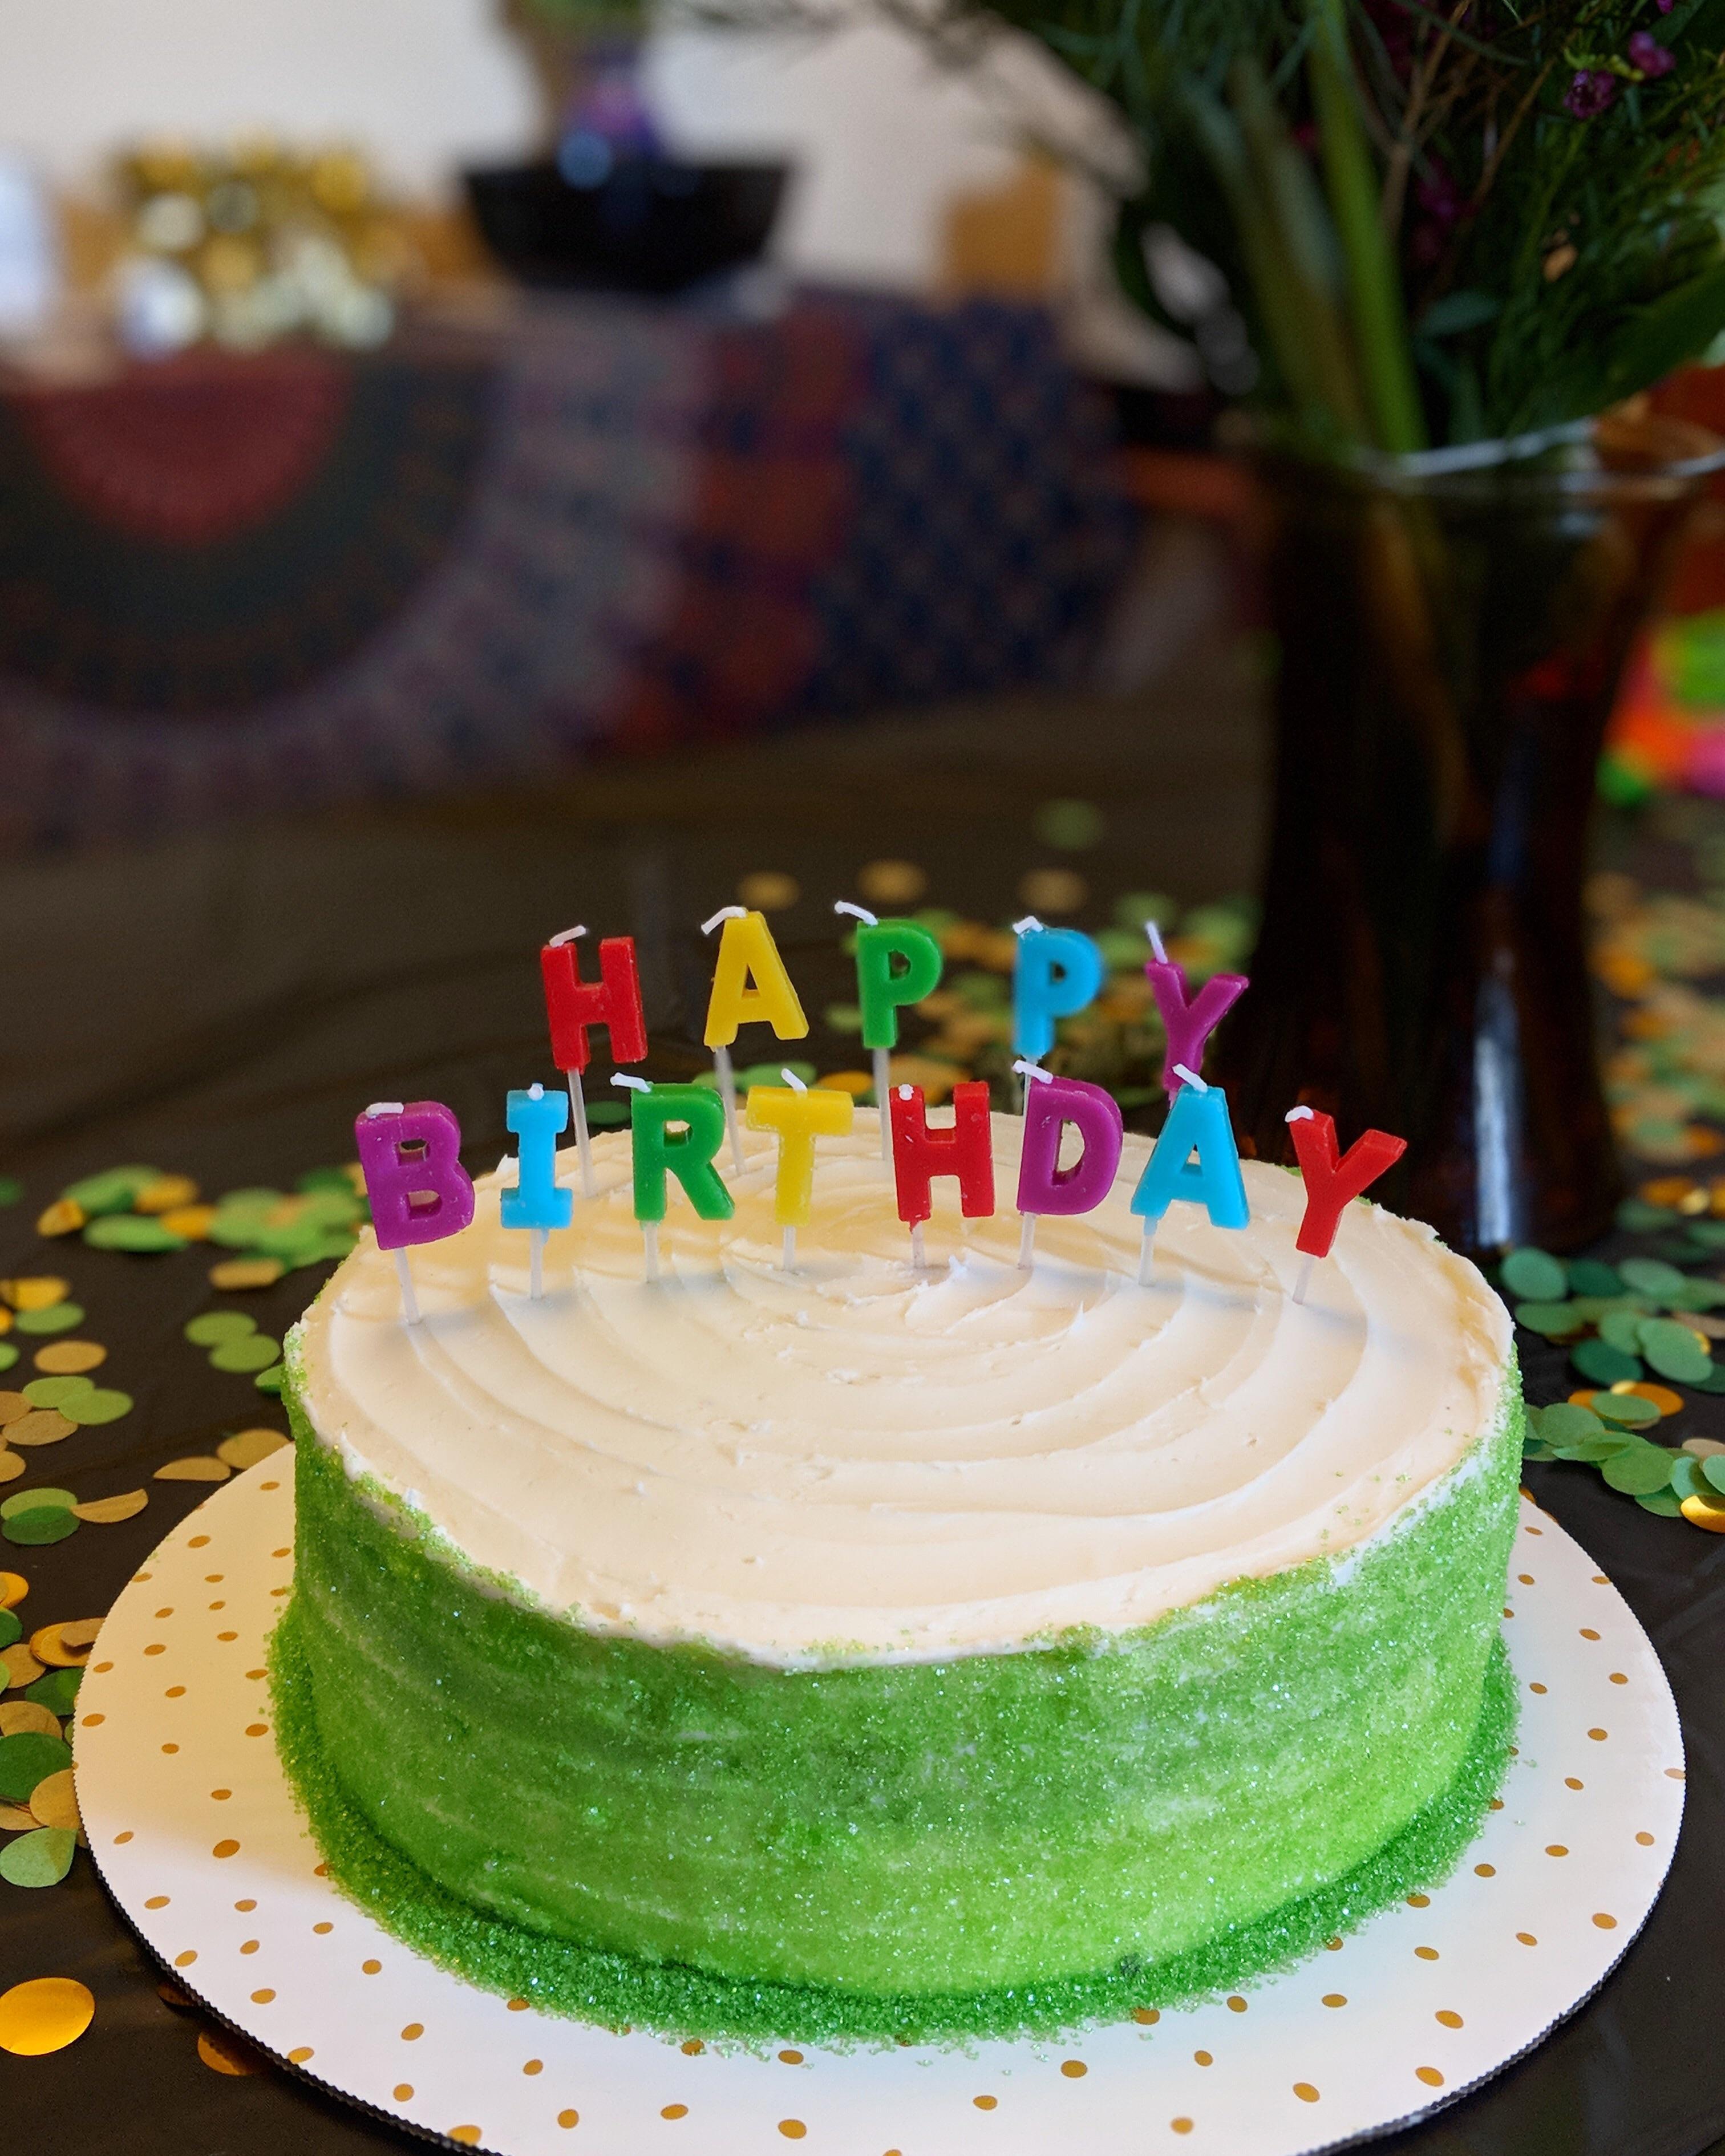 St Patrick S Day Birthday Cake Red Velvet Dyed Green Instead With Vanilla Buttercream And Sprinkles Baking